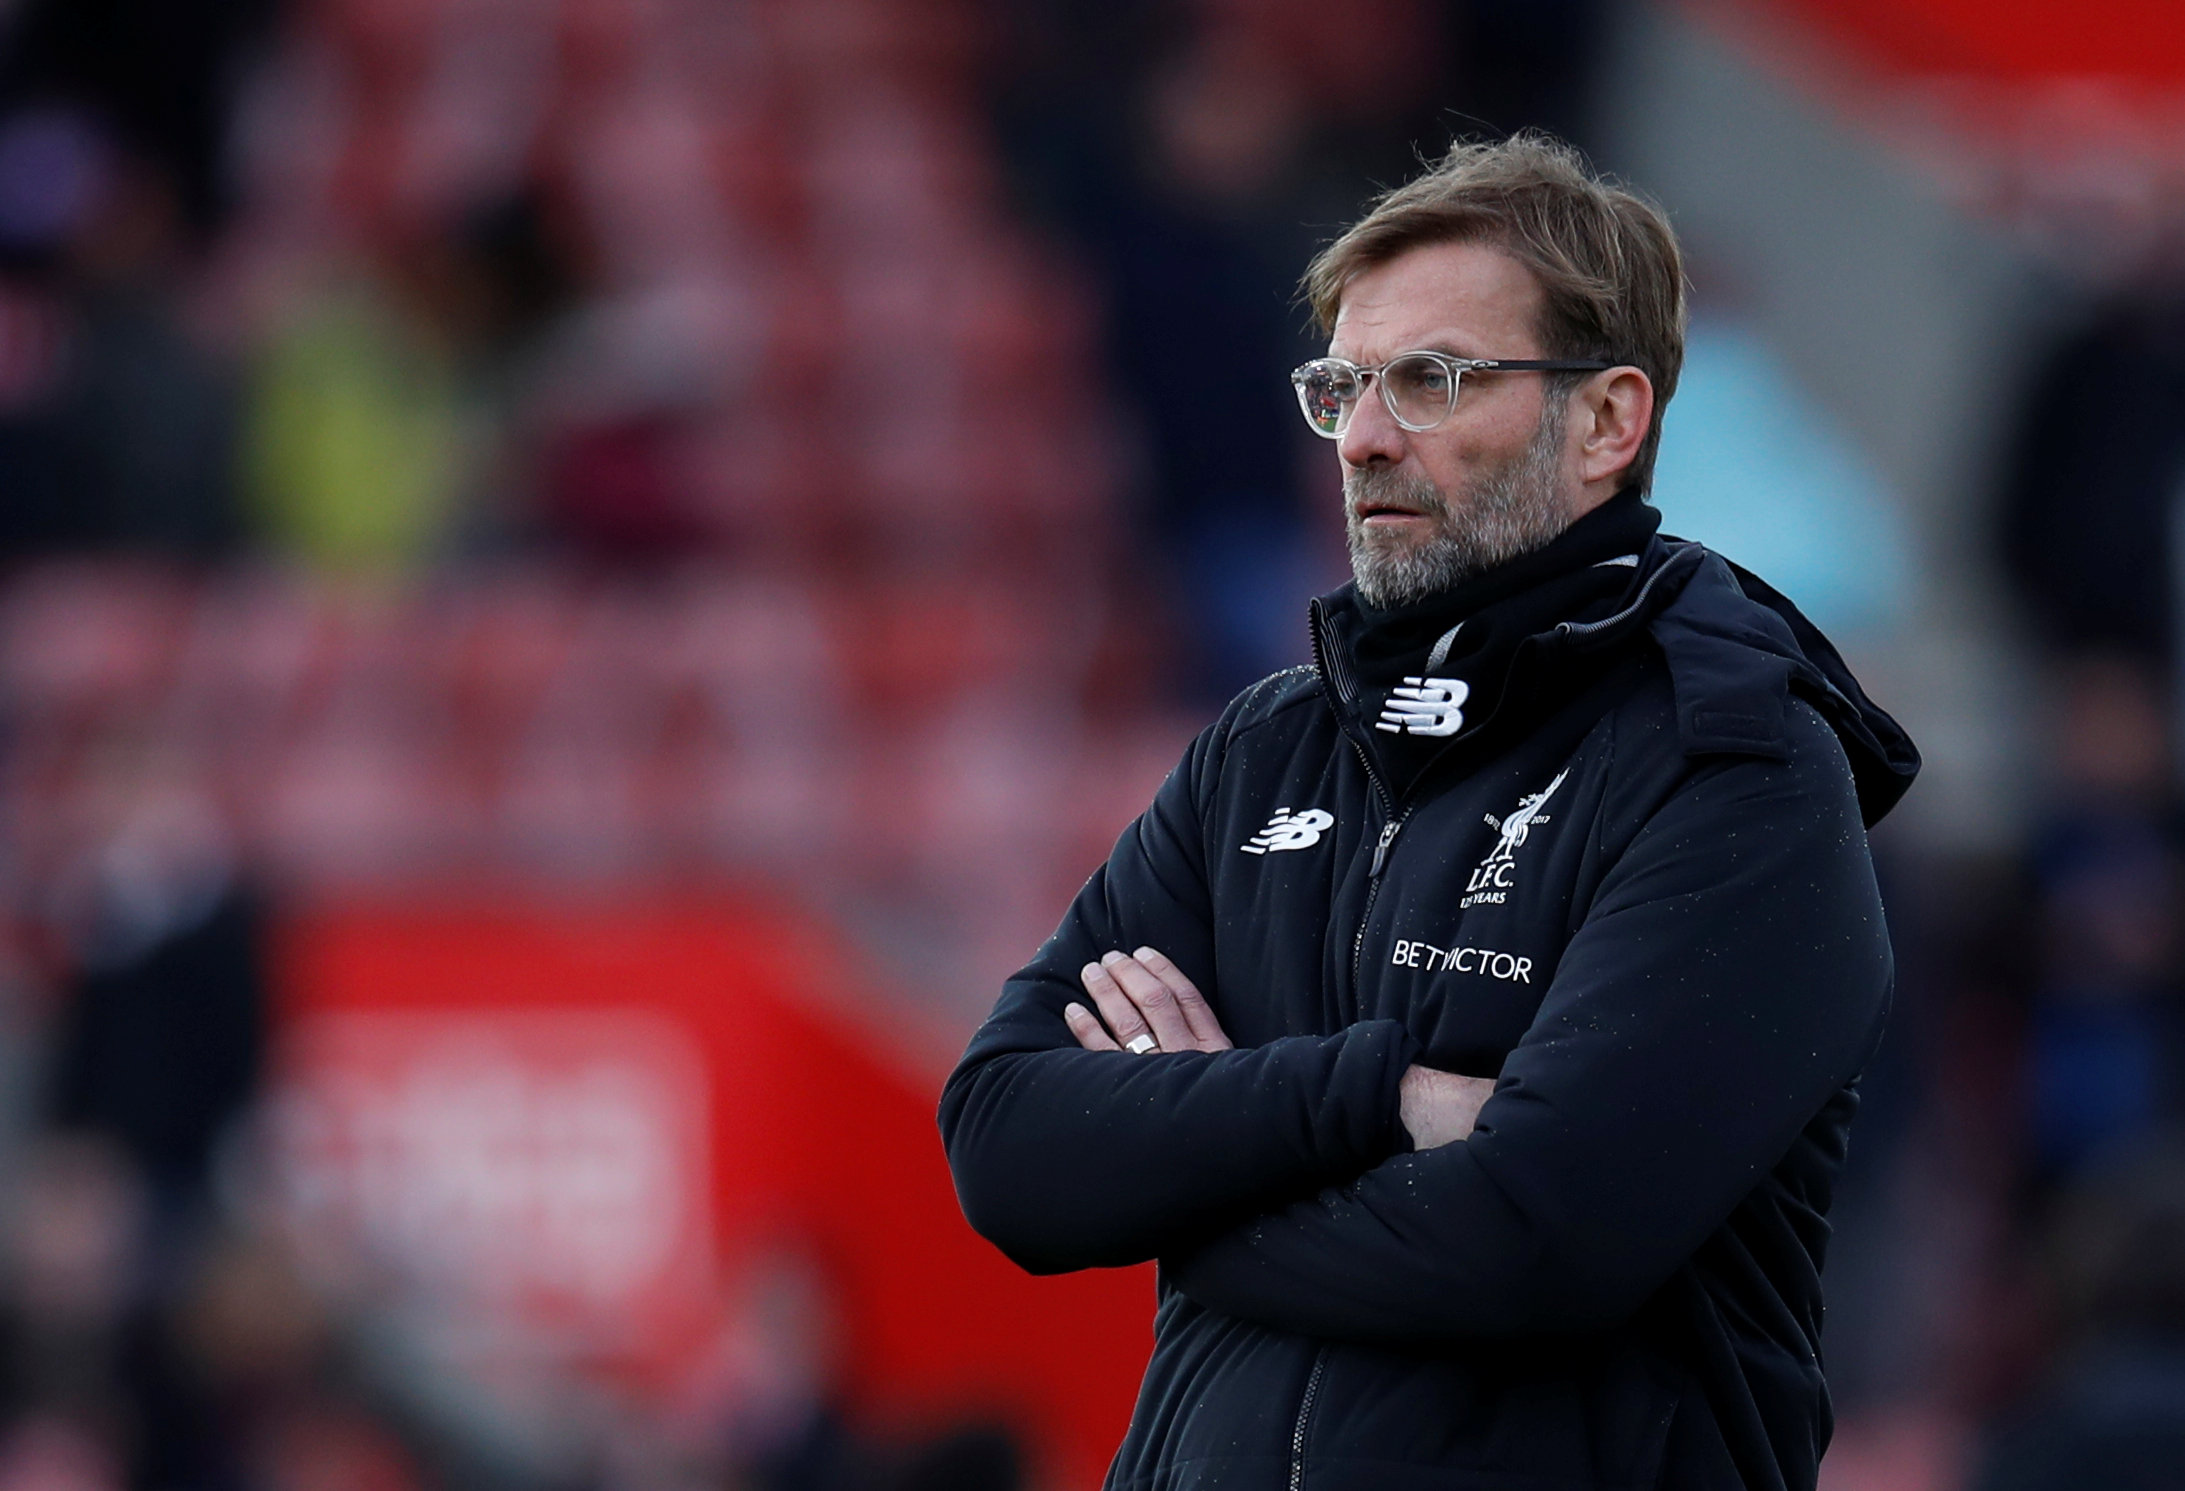 Klopp praises Van Dijk after 'fantastic' Southampton return